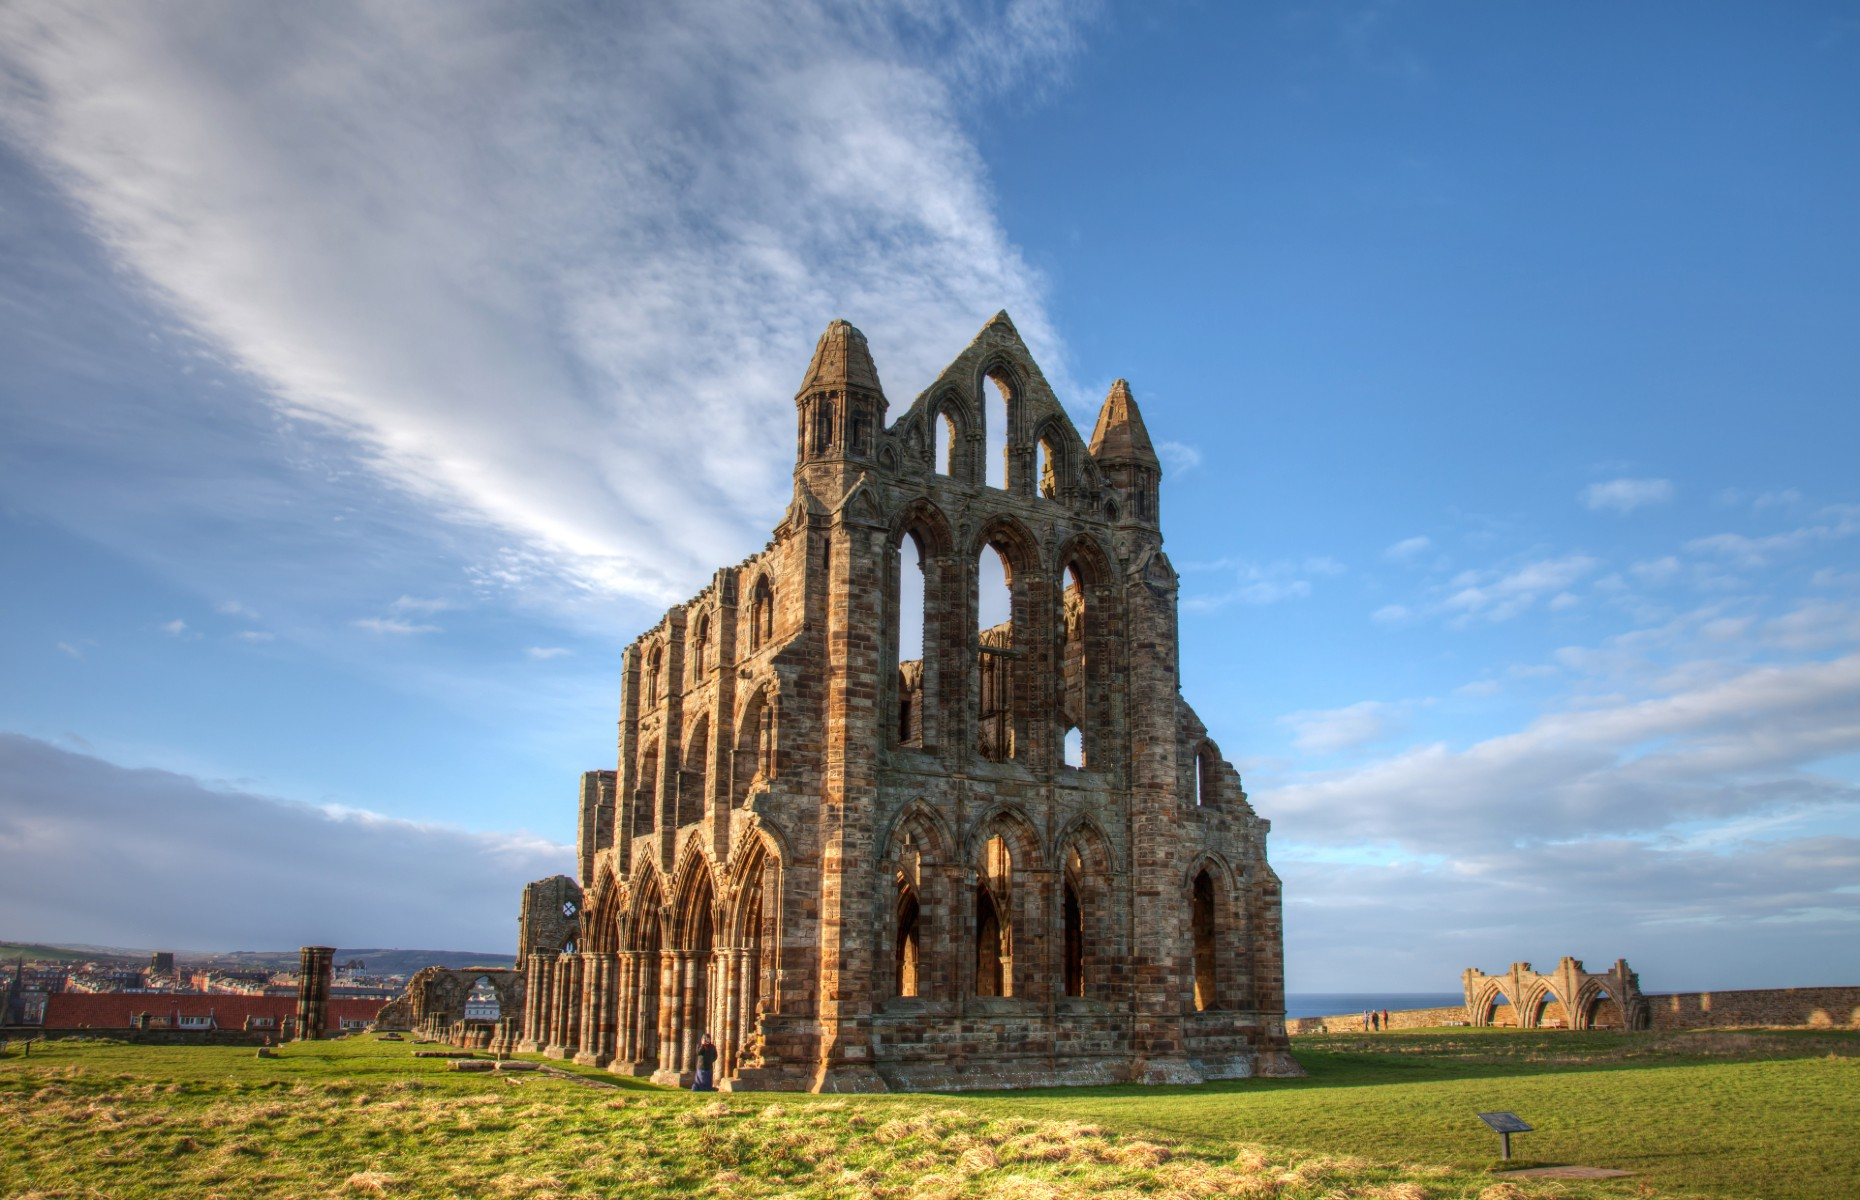 Whitby Abbey (Image: Gail Johnson/Shutterstock)